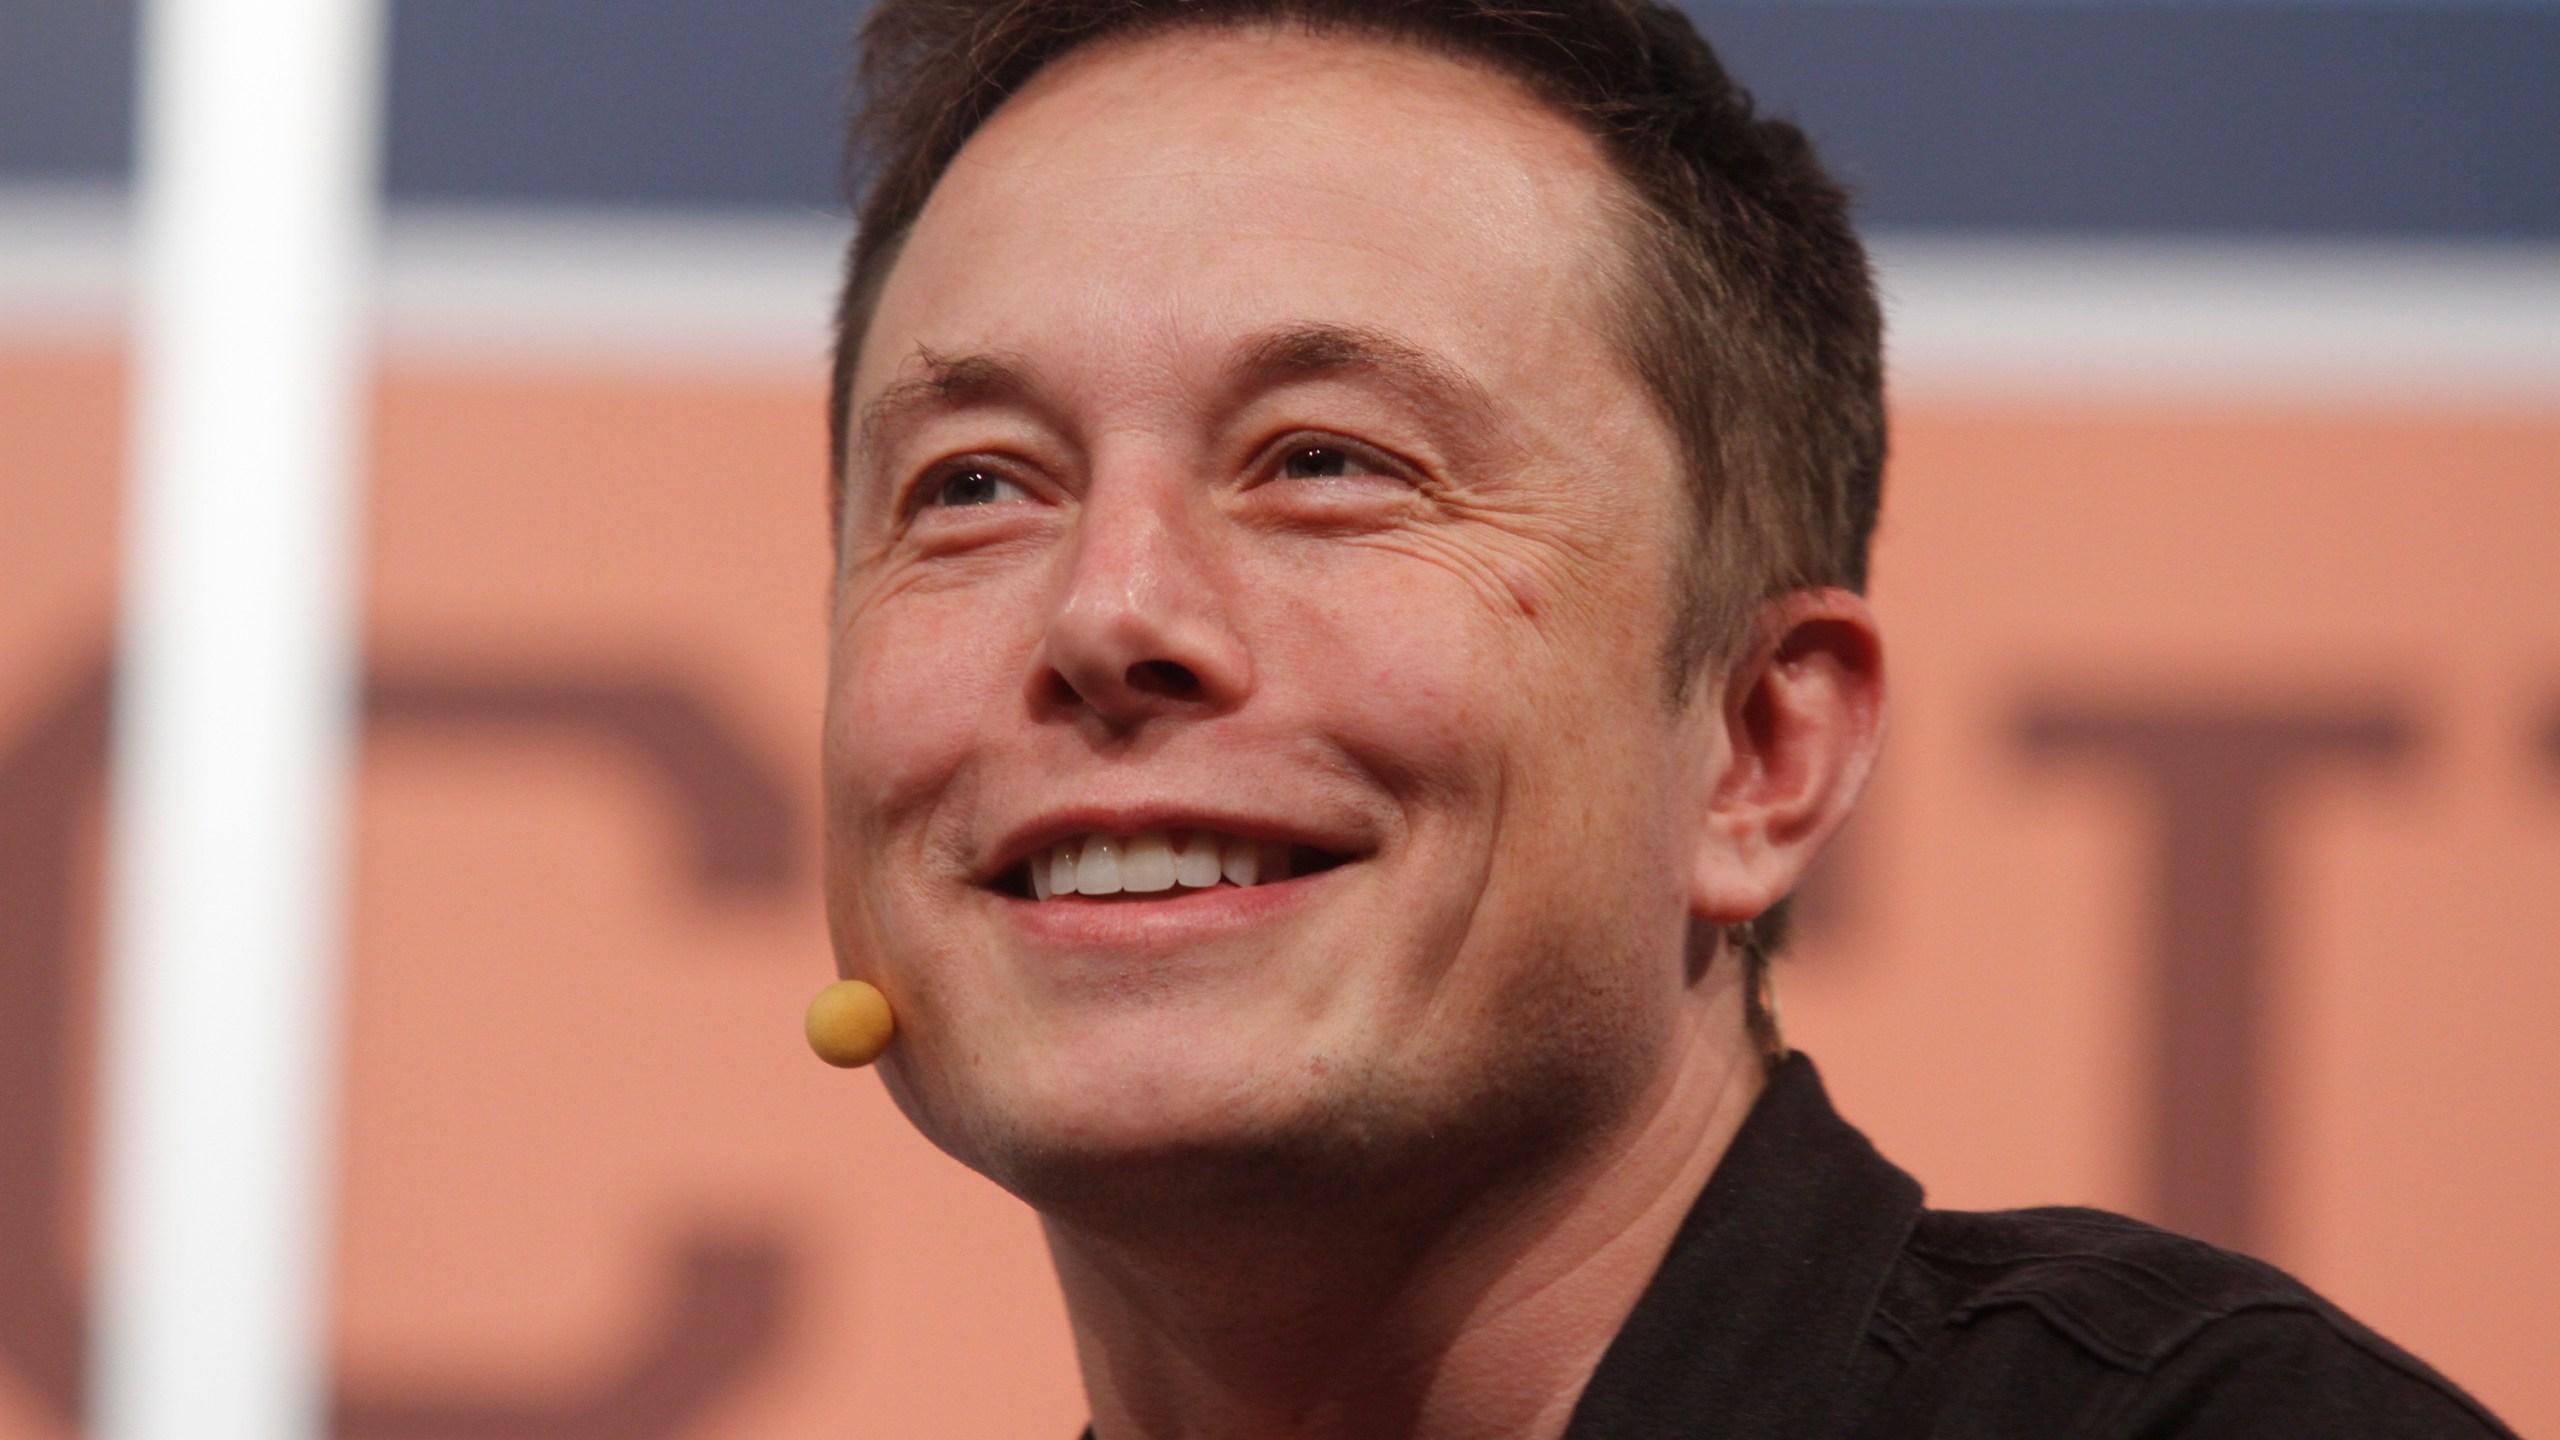 US_Tesla_Musk_88065-159532.jpg97826353